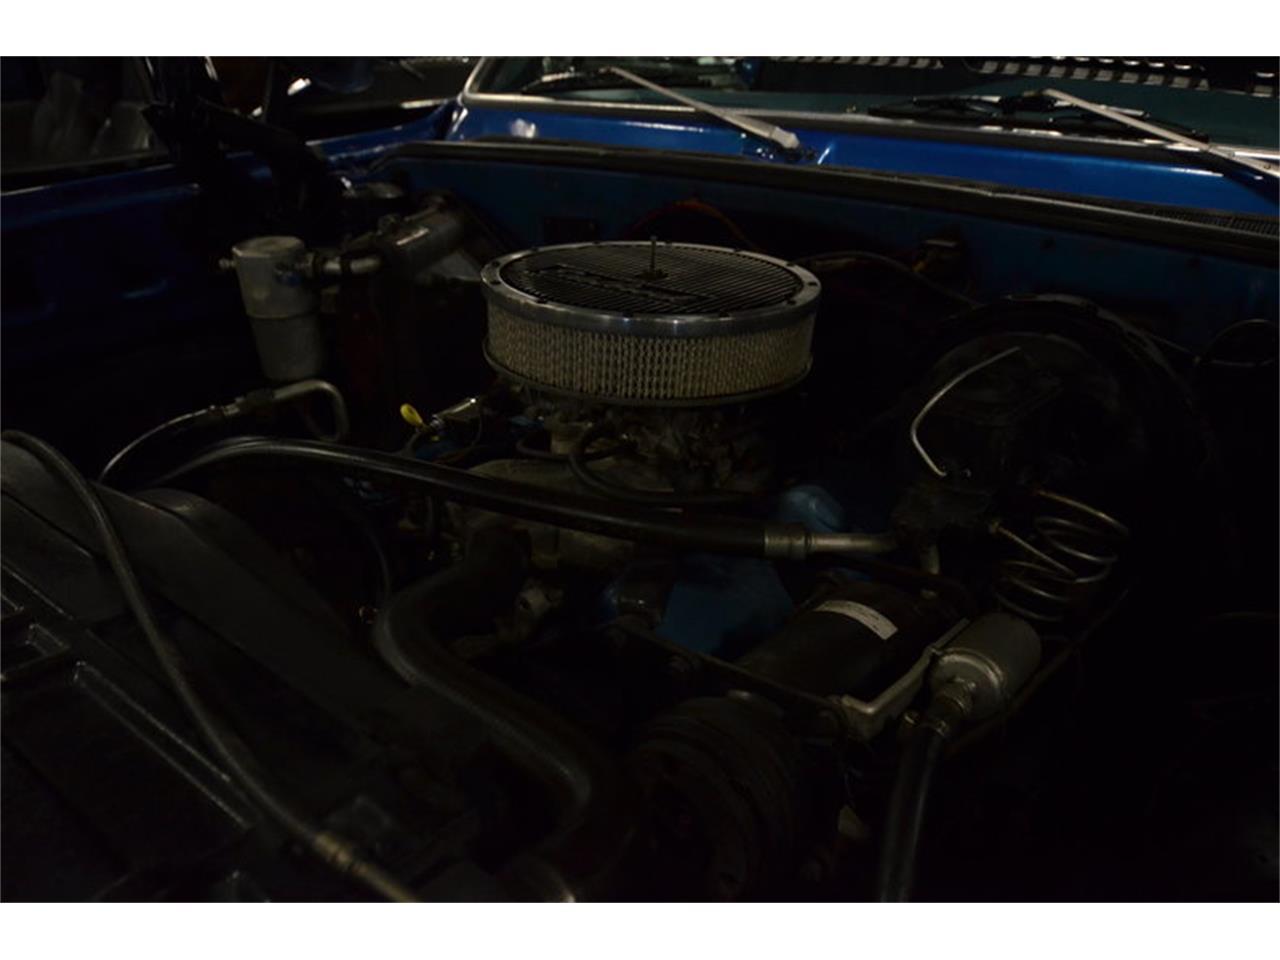 1975 Gmc Sierra Beau James Edition For Sale Classiccars Com Cc 1076114